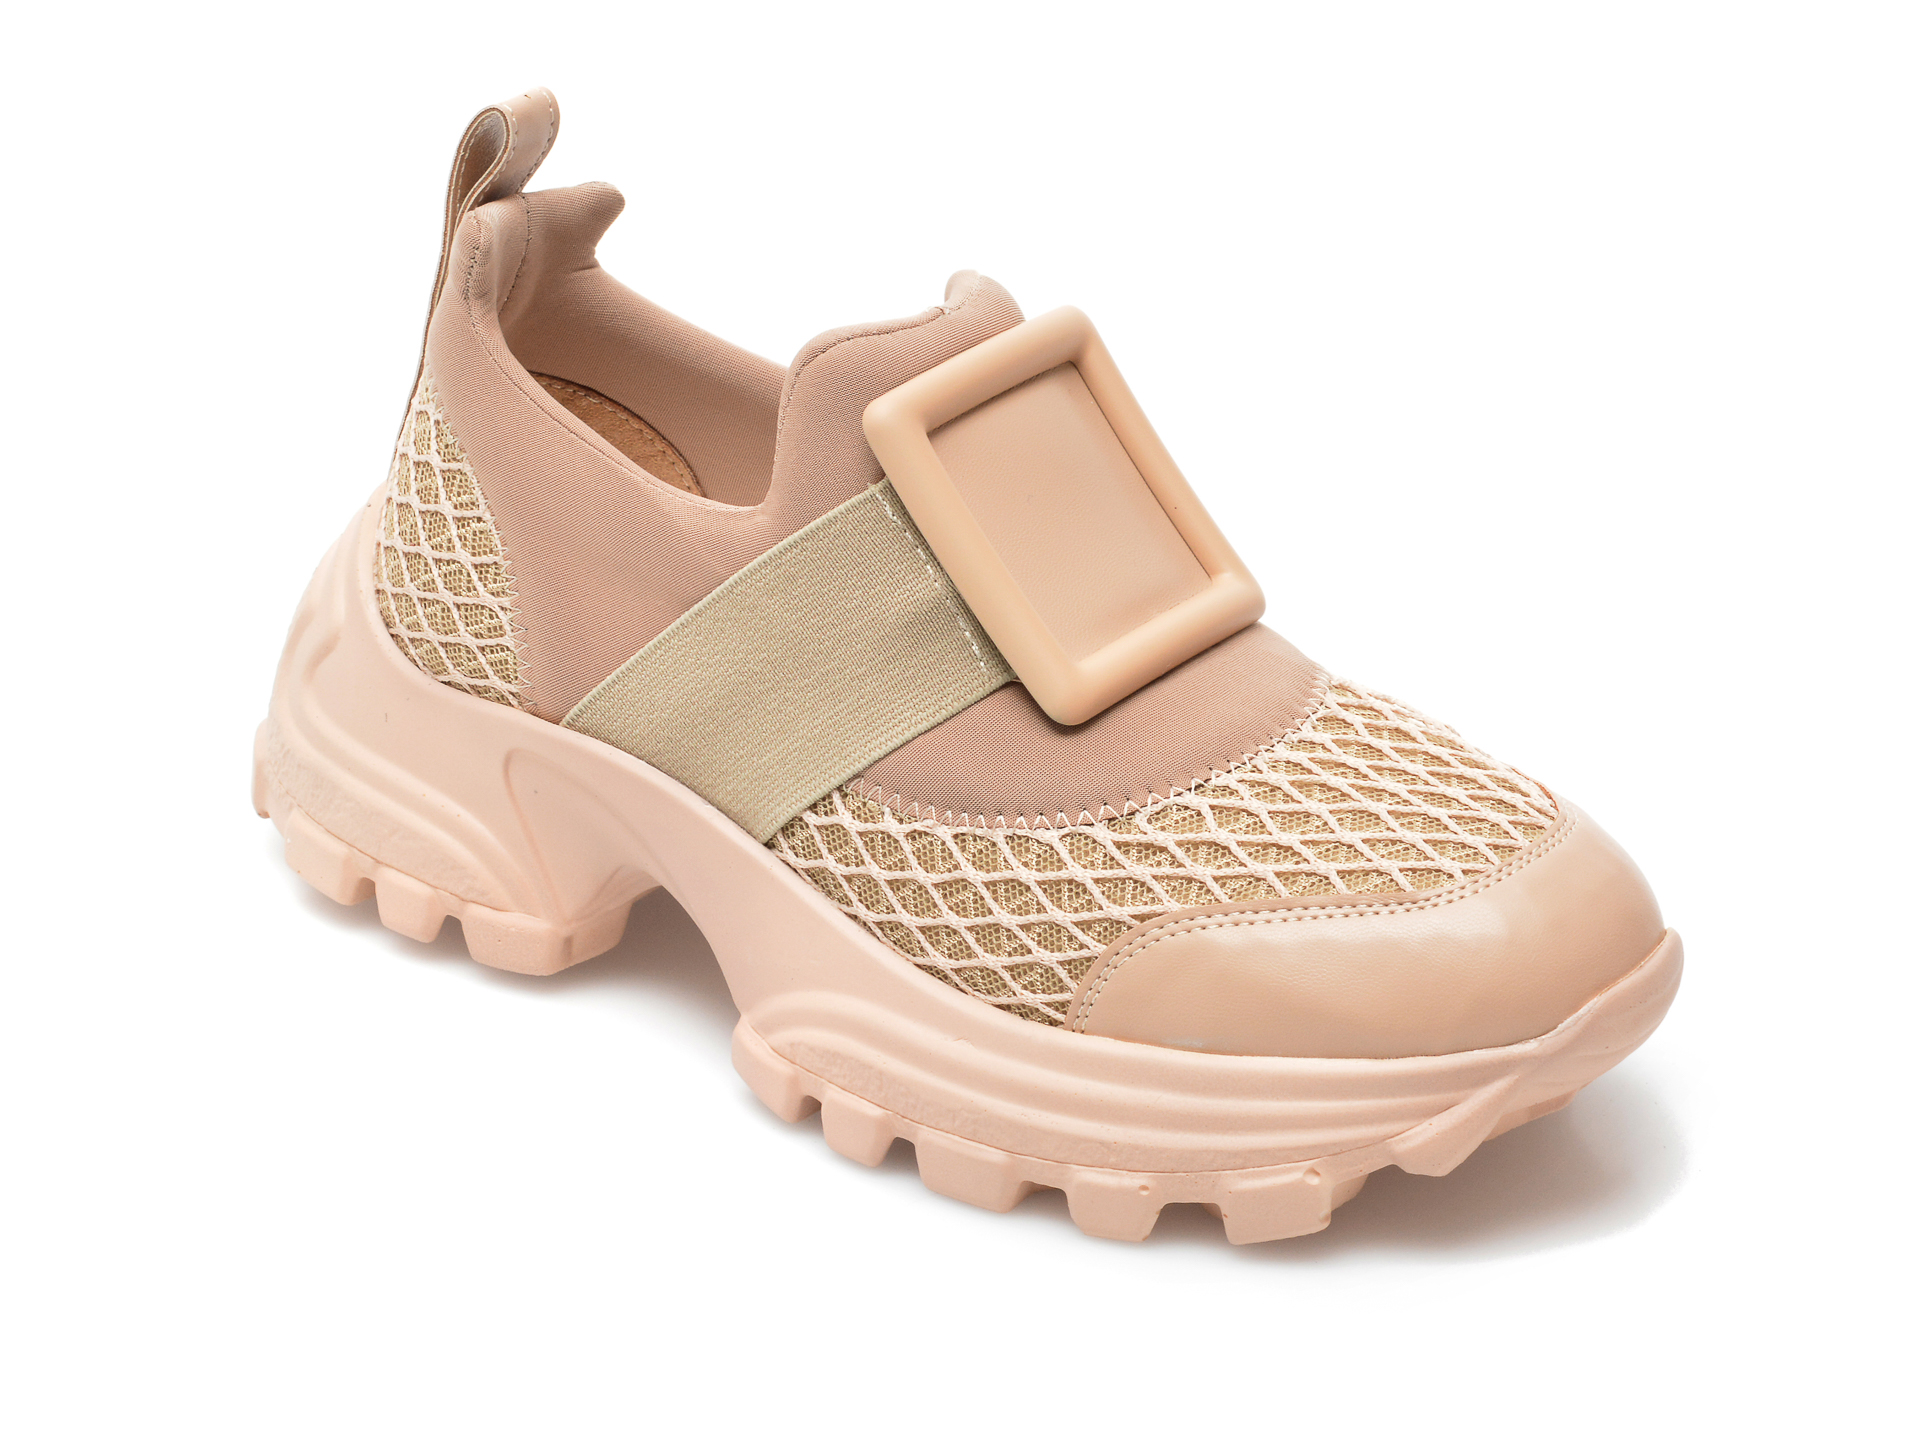 Pantofi Sport Gryxx Bej, Mo12410, Din Material Textil Si Piele Ecologica